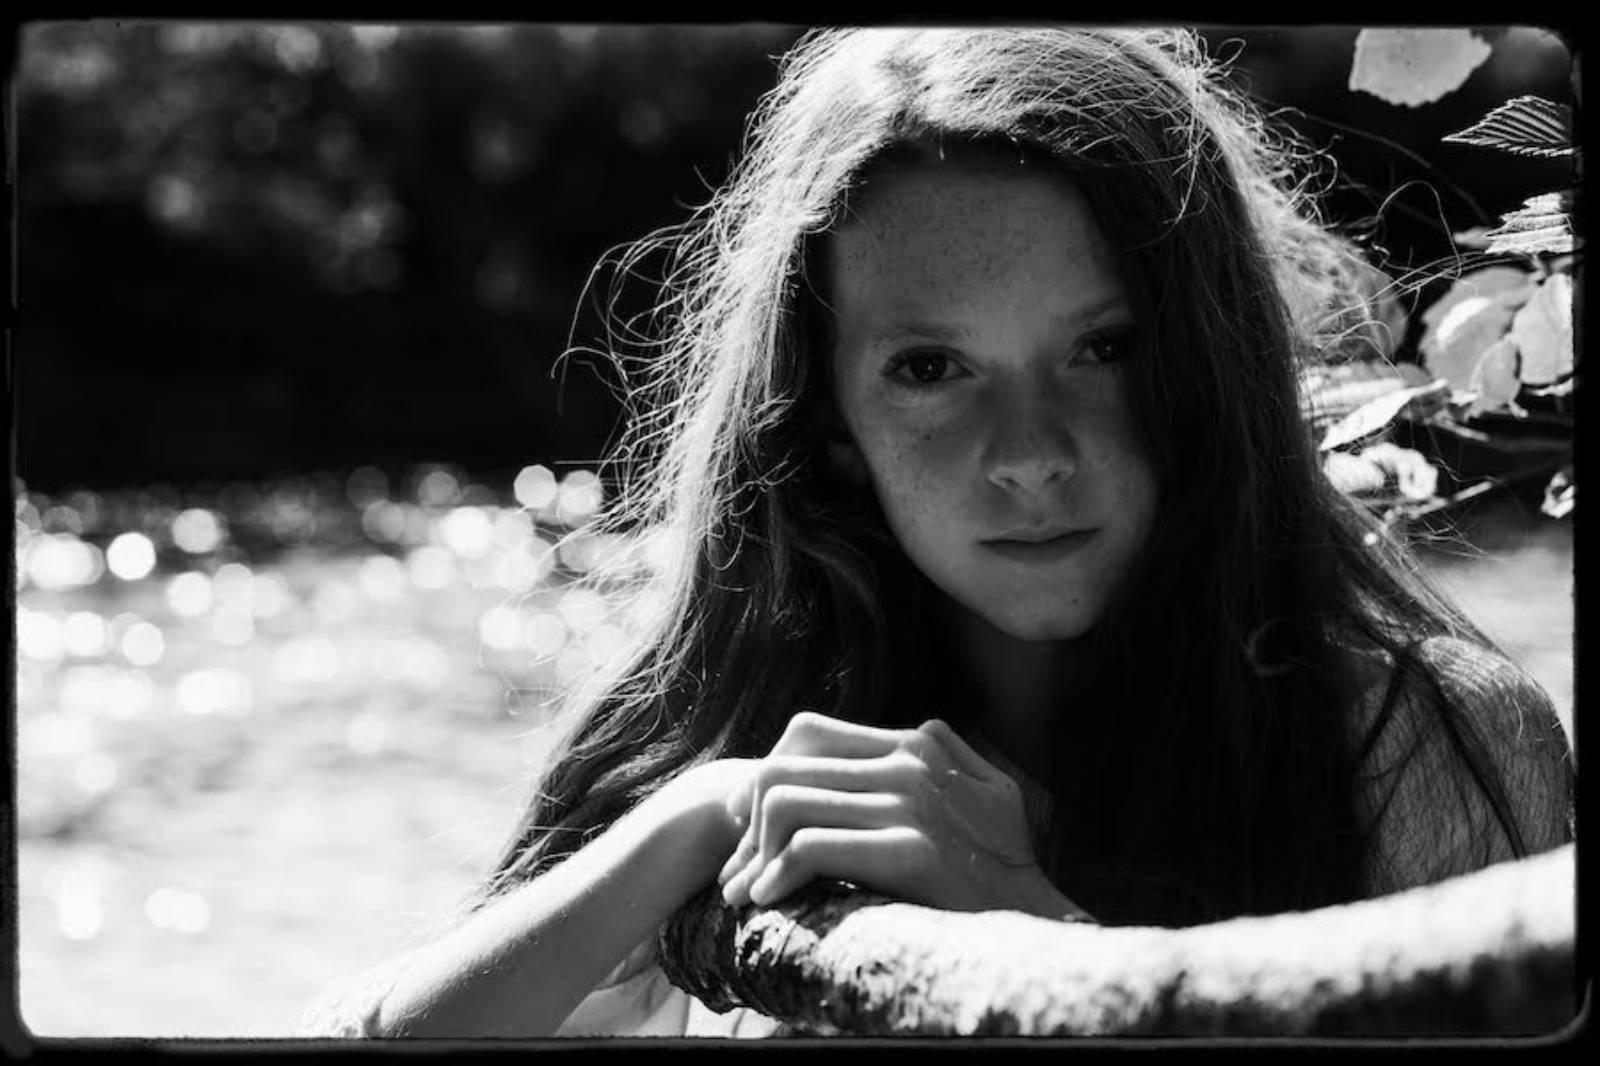 © Christelle Calmettes